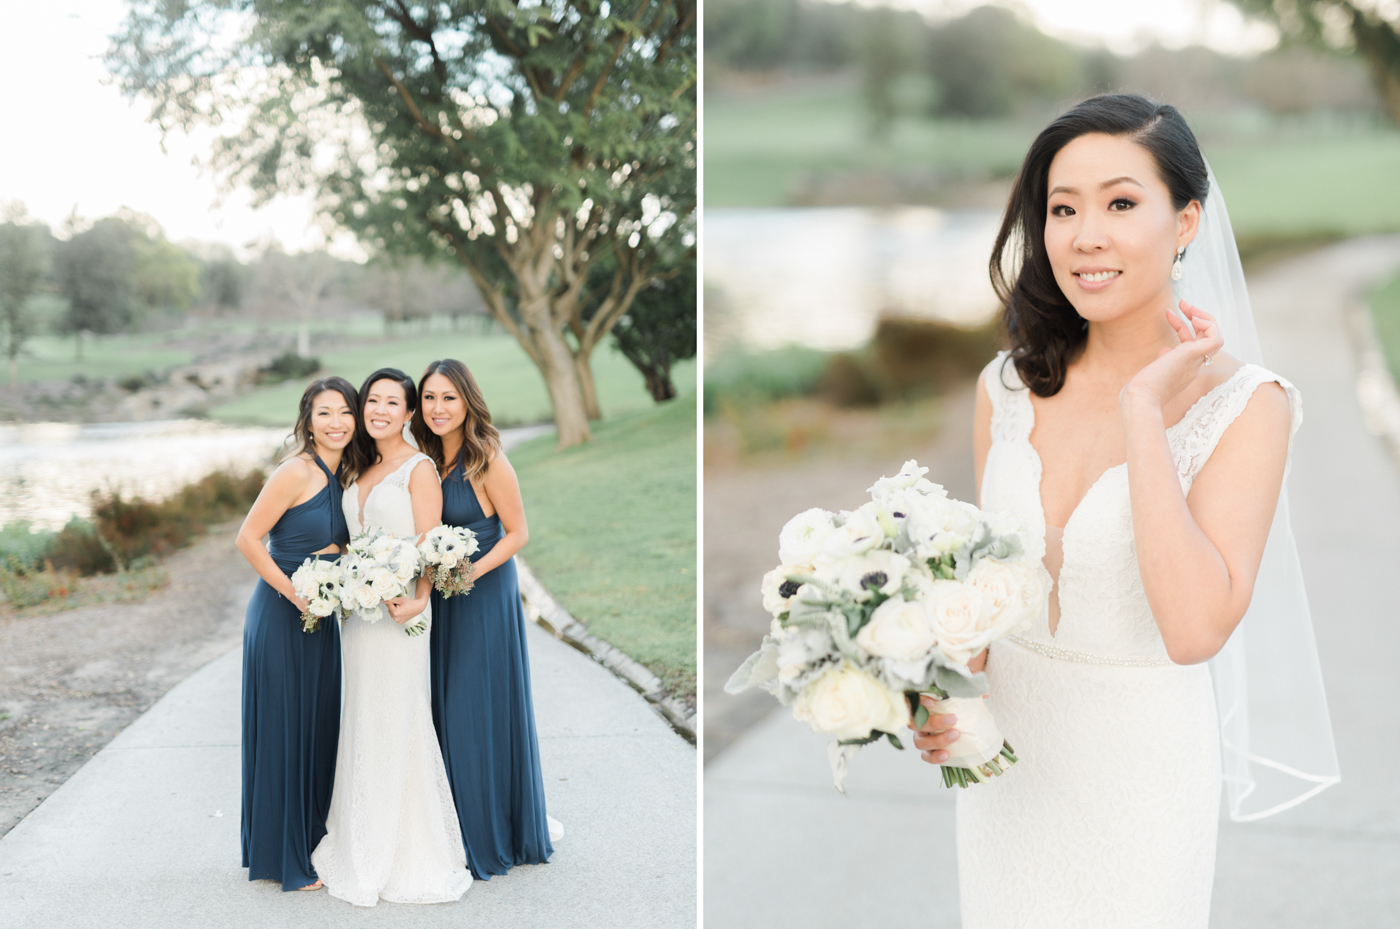 Friendly_Hills_Country_Club_fine_art_wedding_photographer_los_angeles_paris-17.jpg